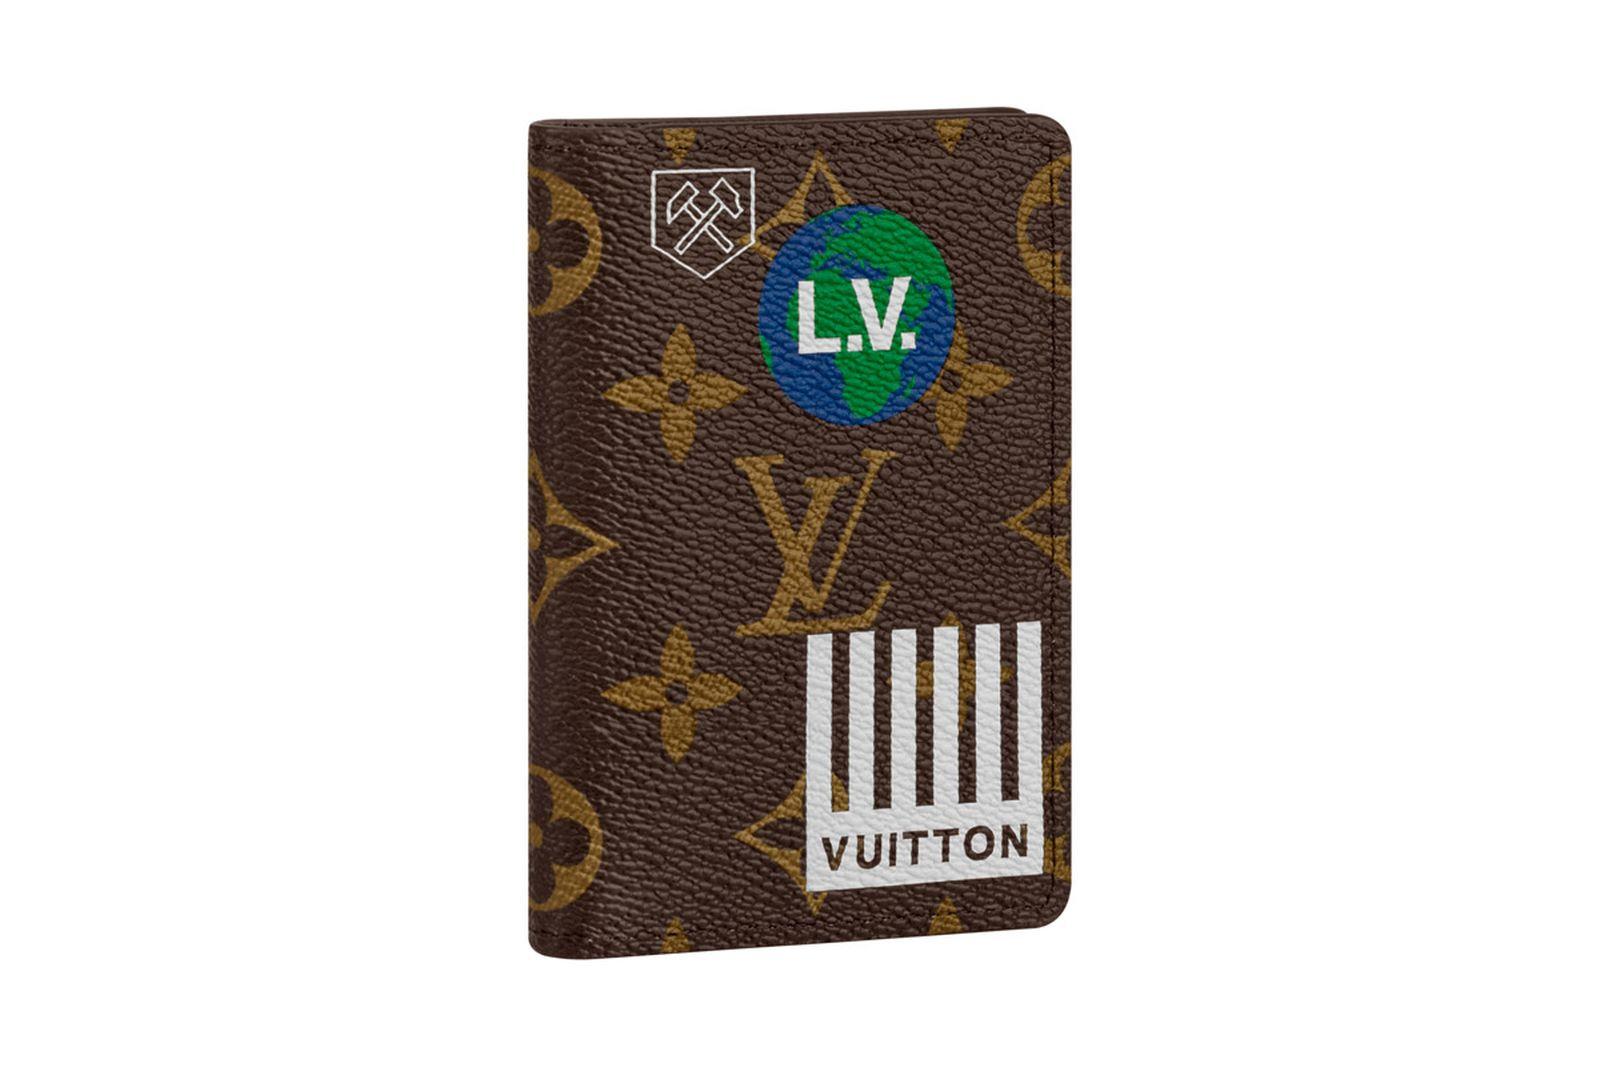 lv pre fall Louis Vuitton virgil abloh